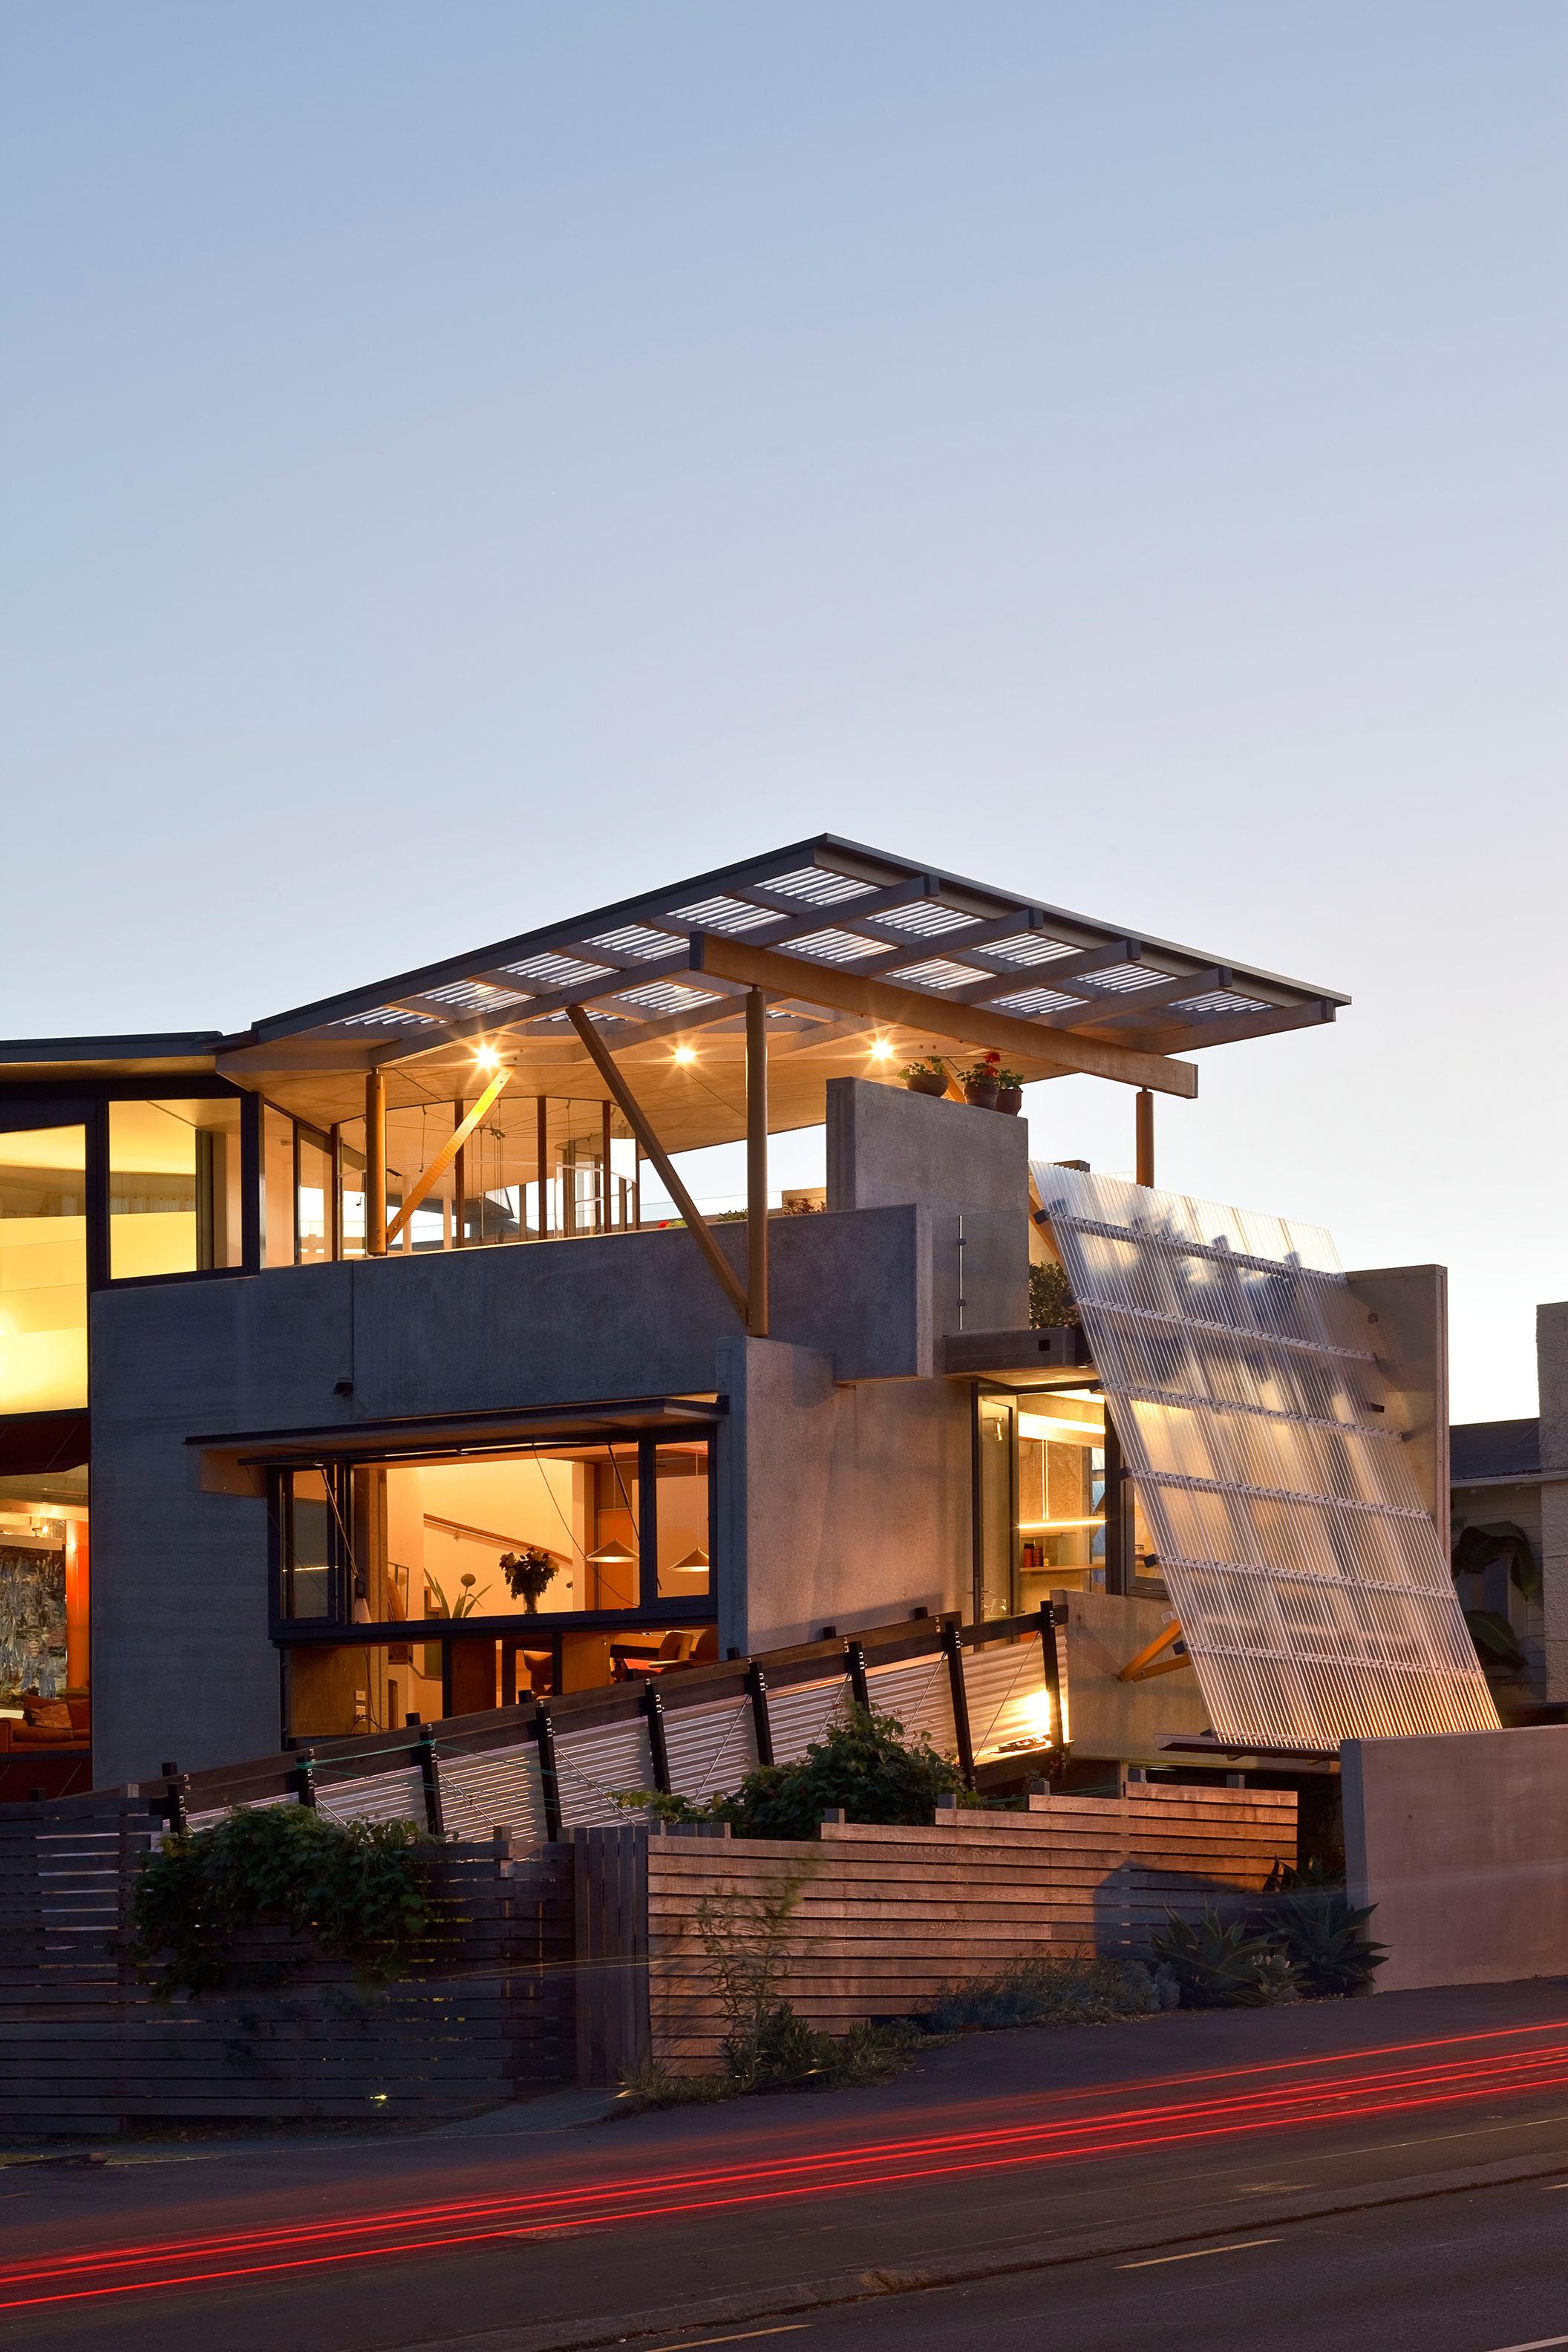 Narrow Neck House Mitchell & Stout Architects 2.jpg